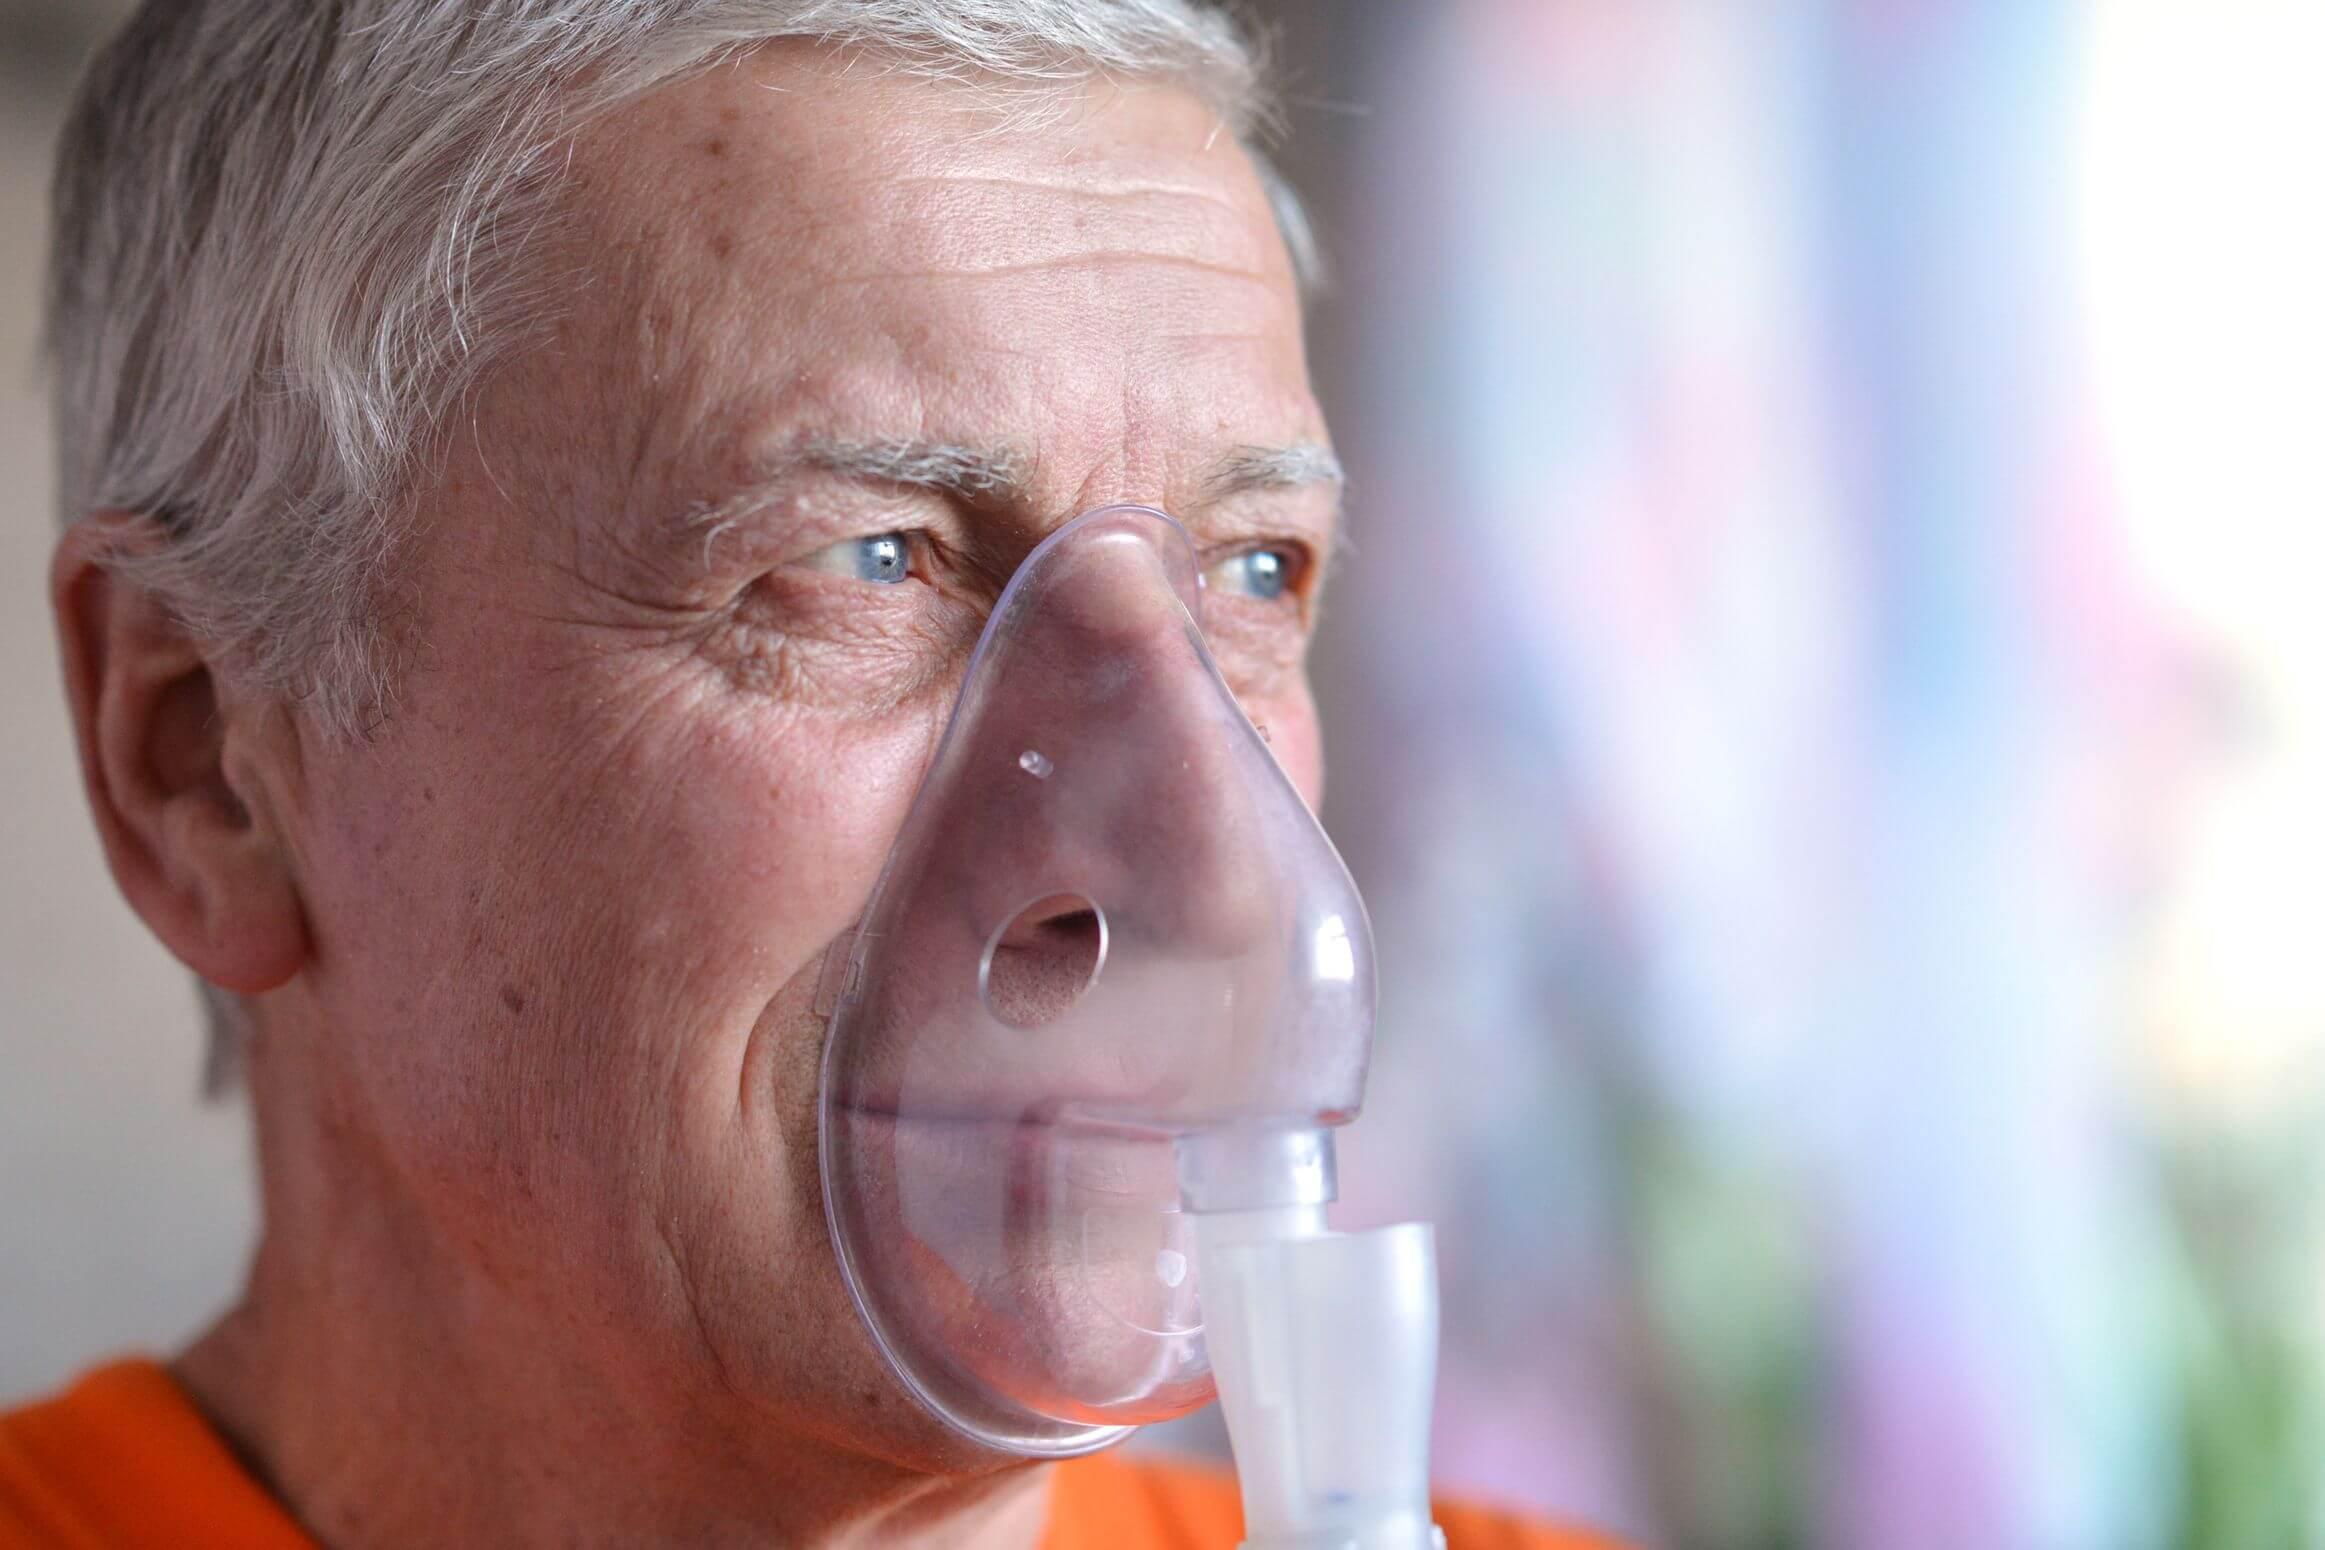 Medical Grade Oxygen